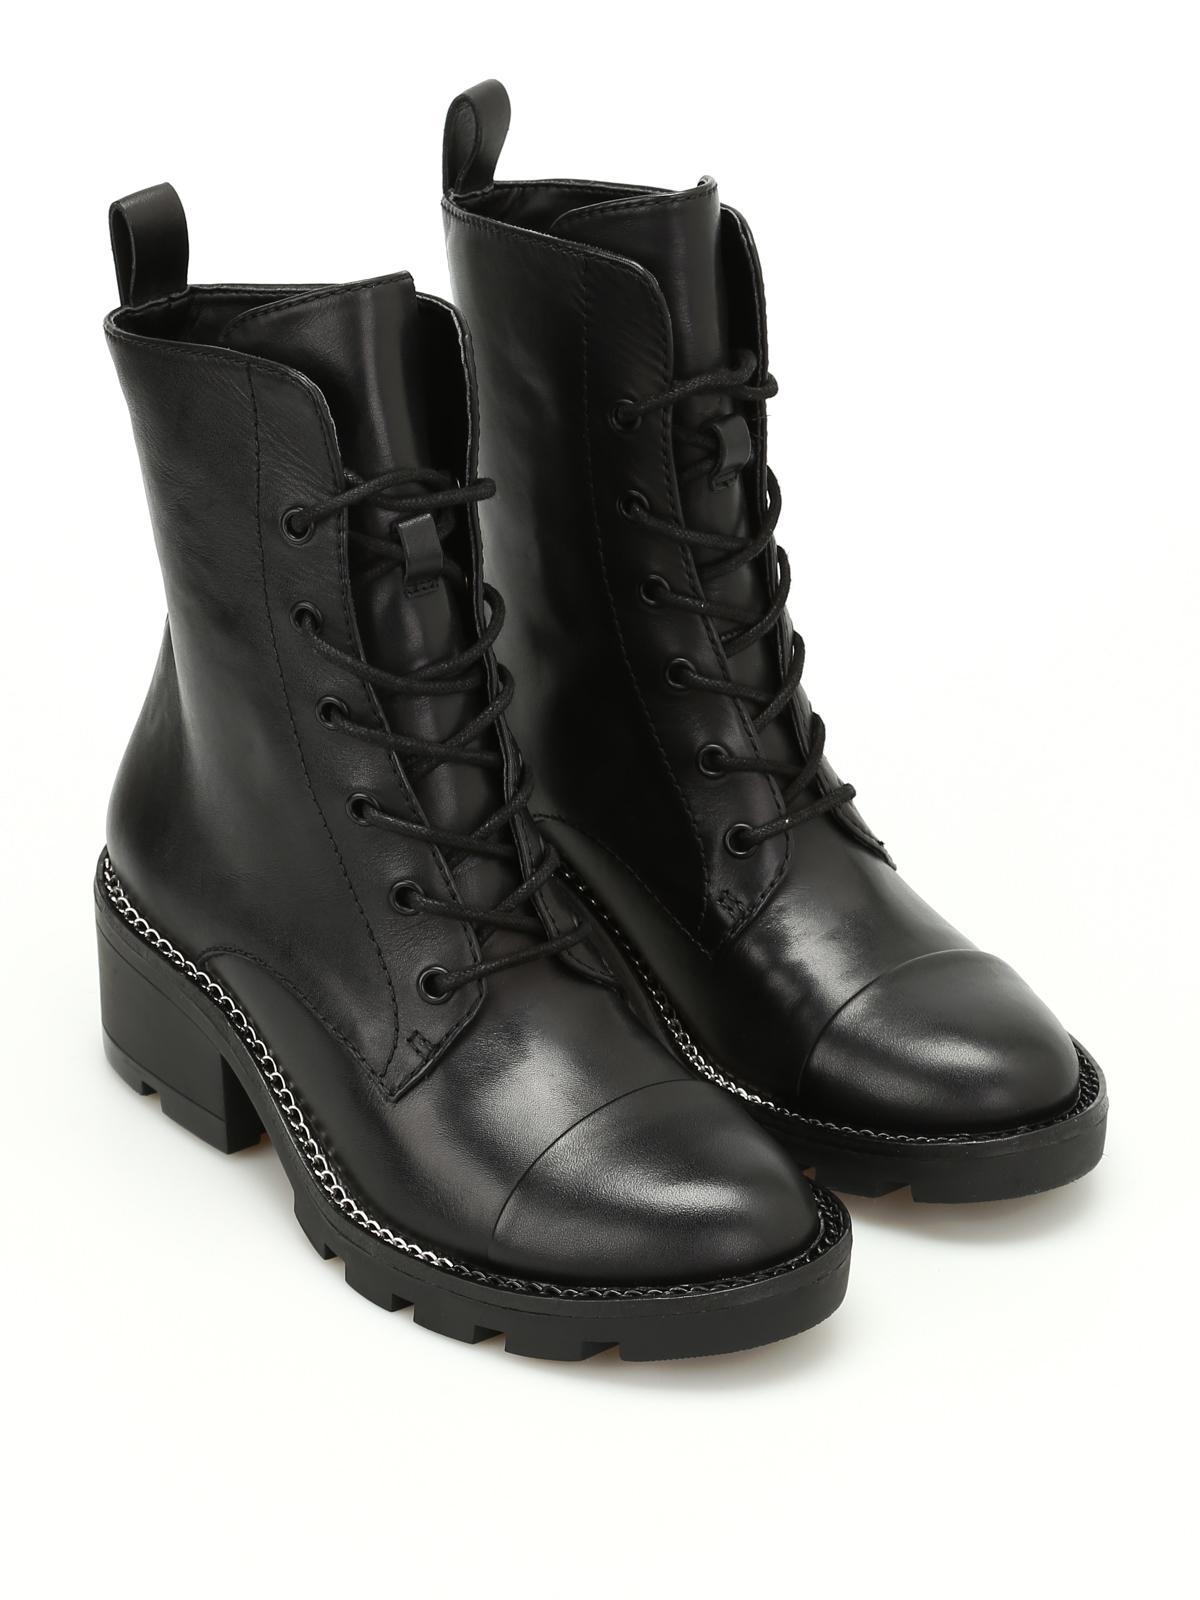 Park leather combat boots - ankle boots